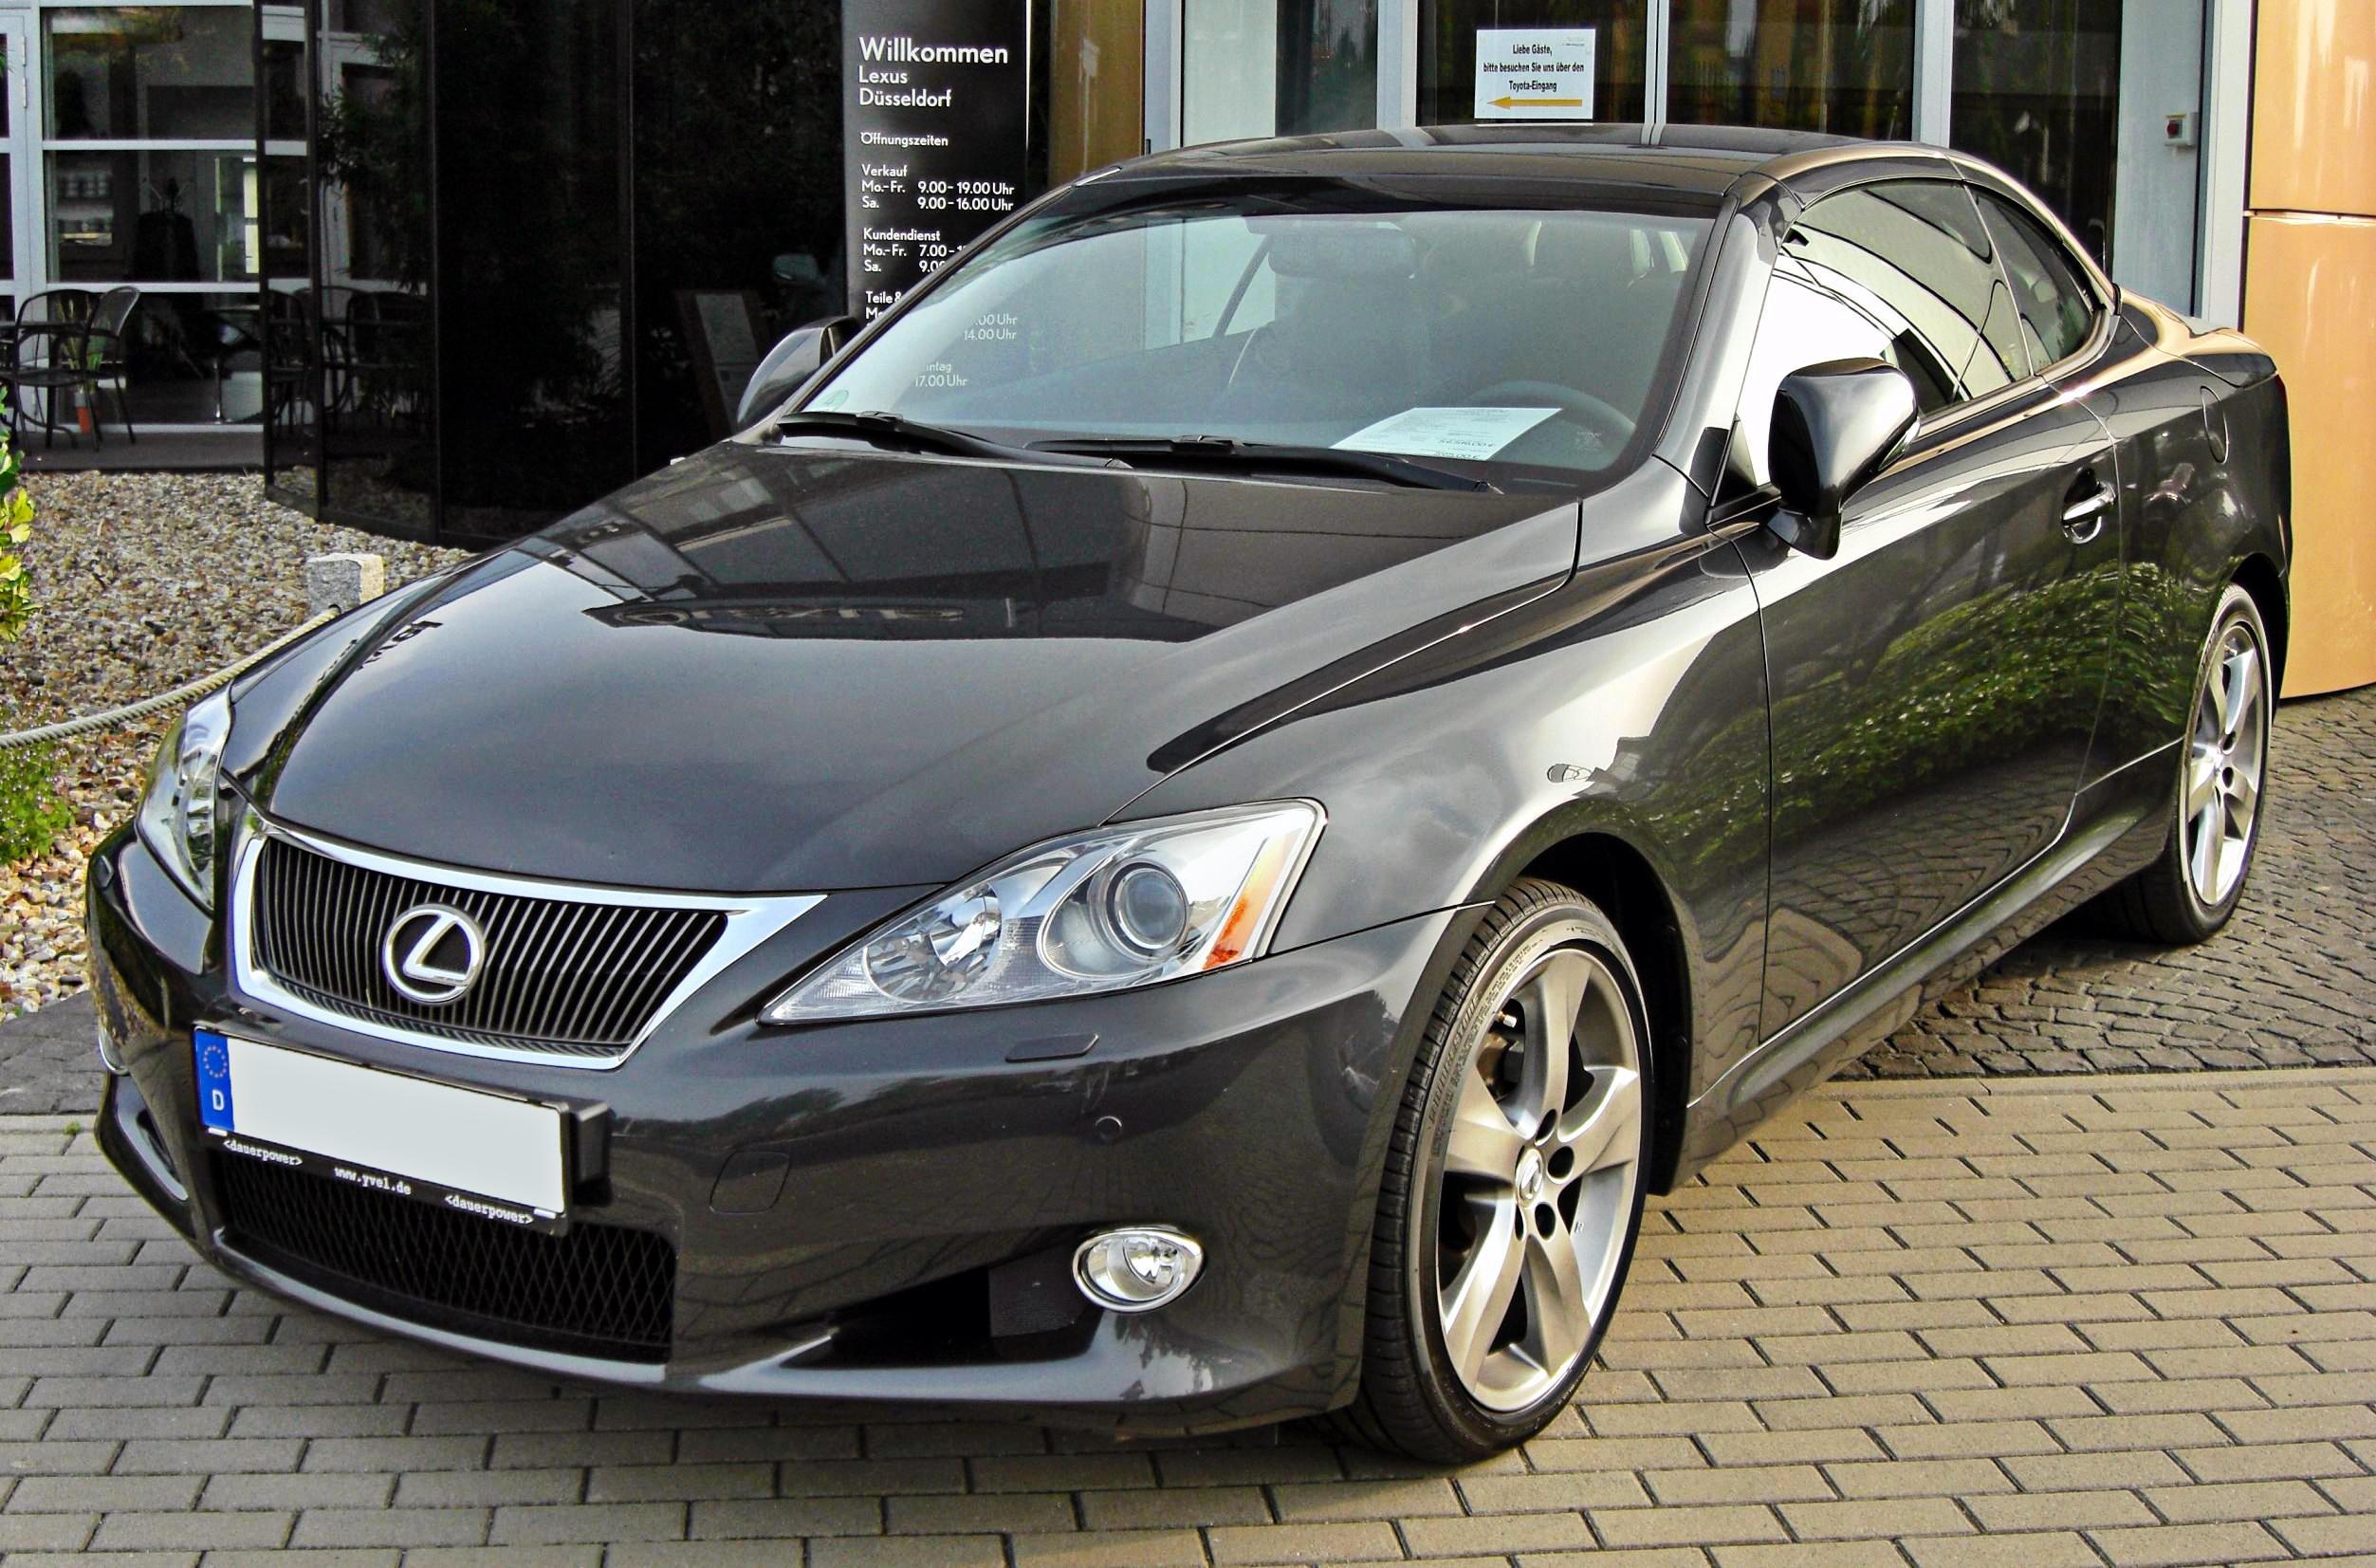 File:Lexus IS 250 C 20090809 Front.JPG